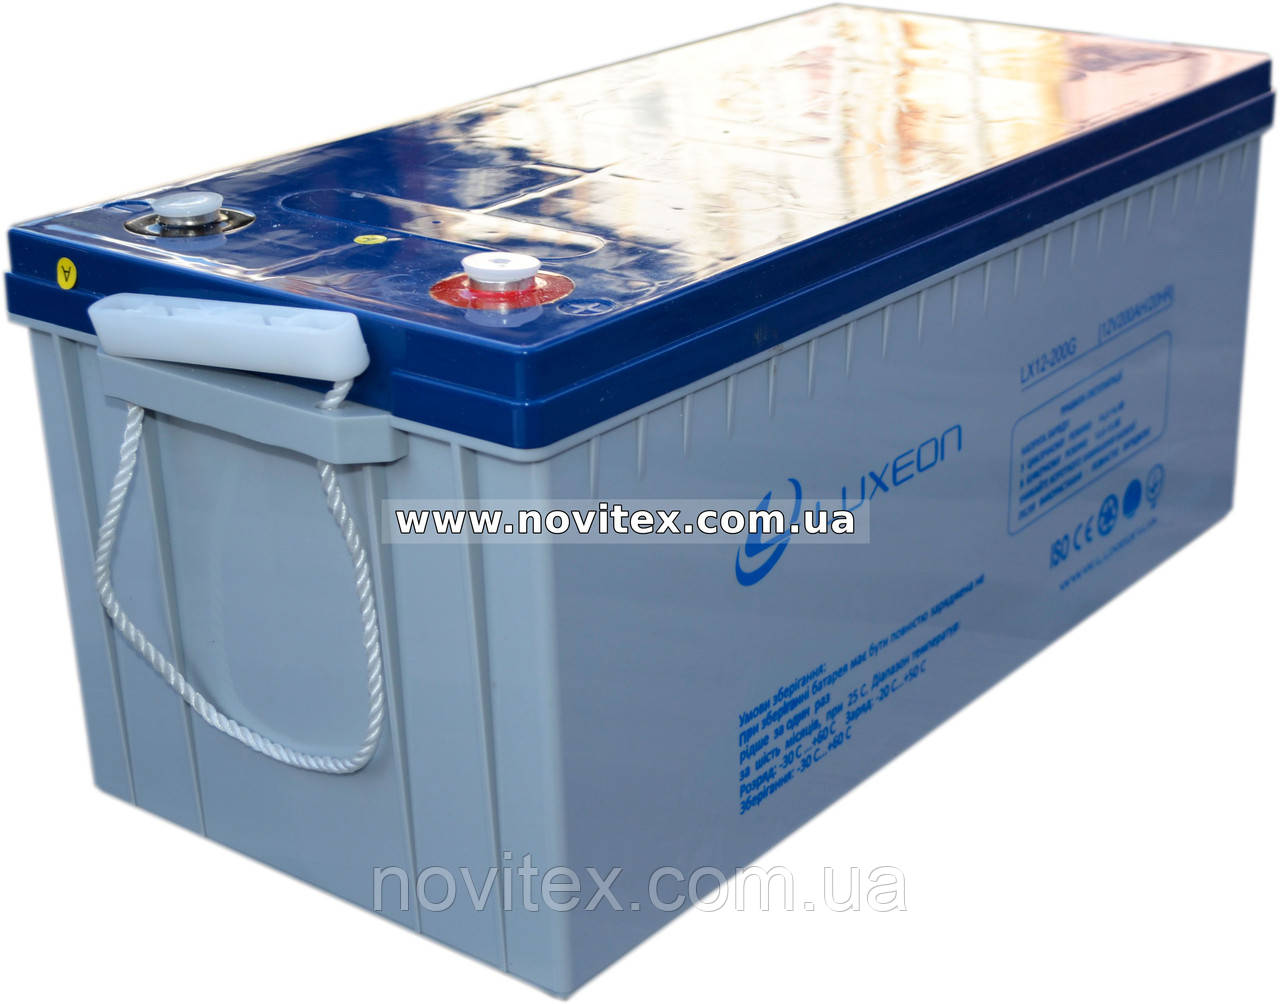 Аккумулятор гелевый Luxeon LX12-200G 12V 200Ah